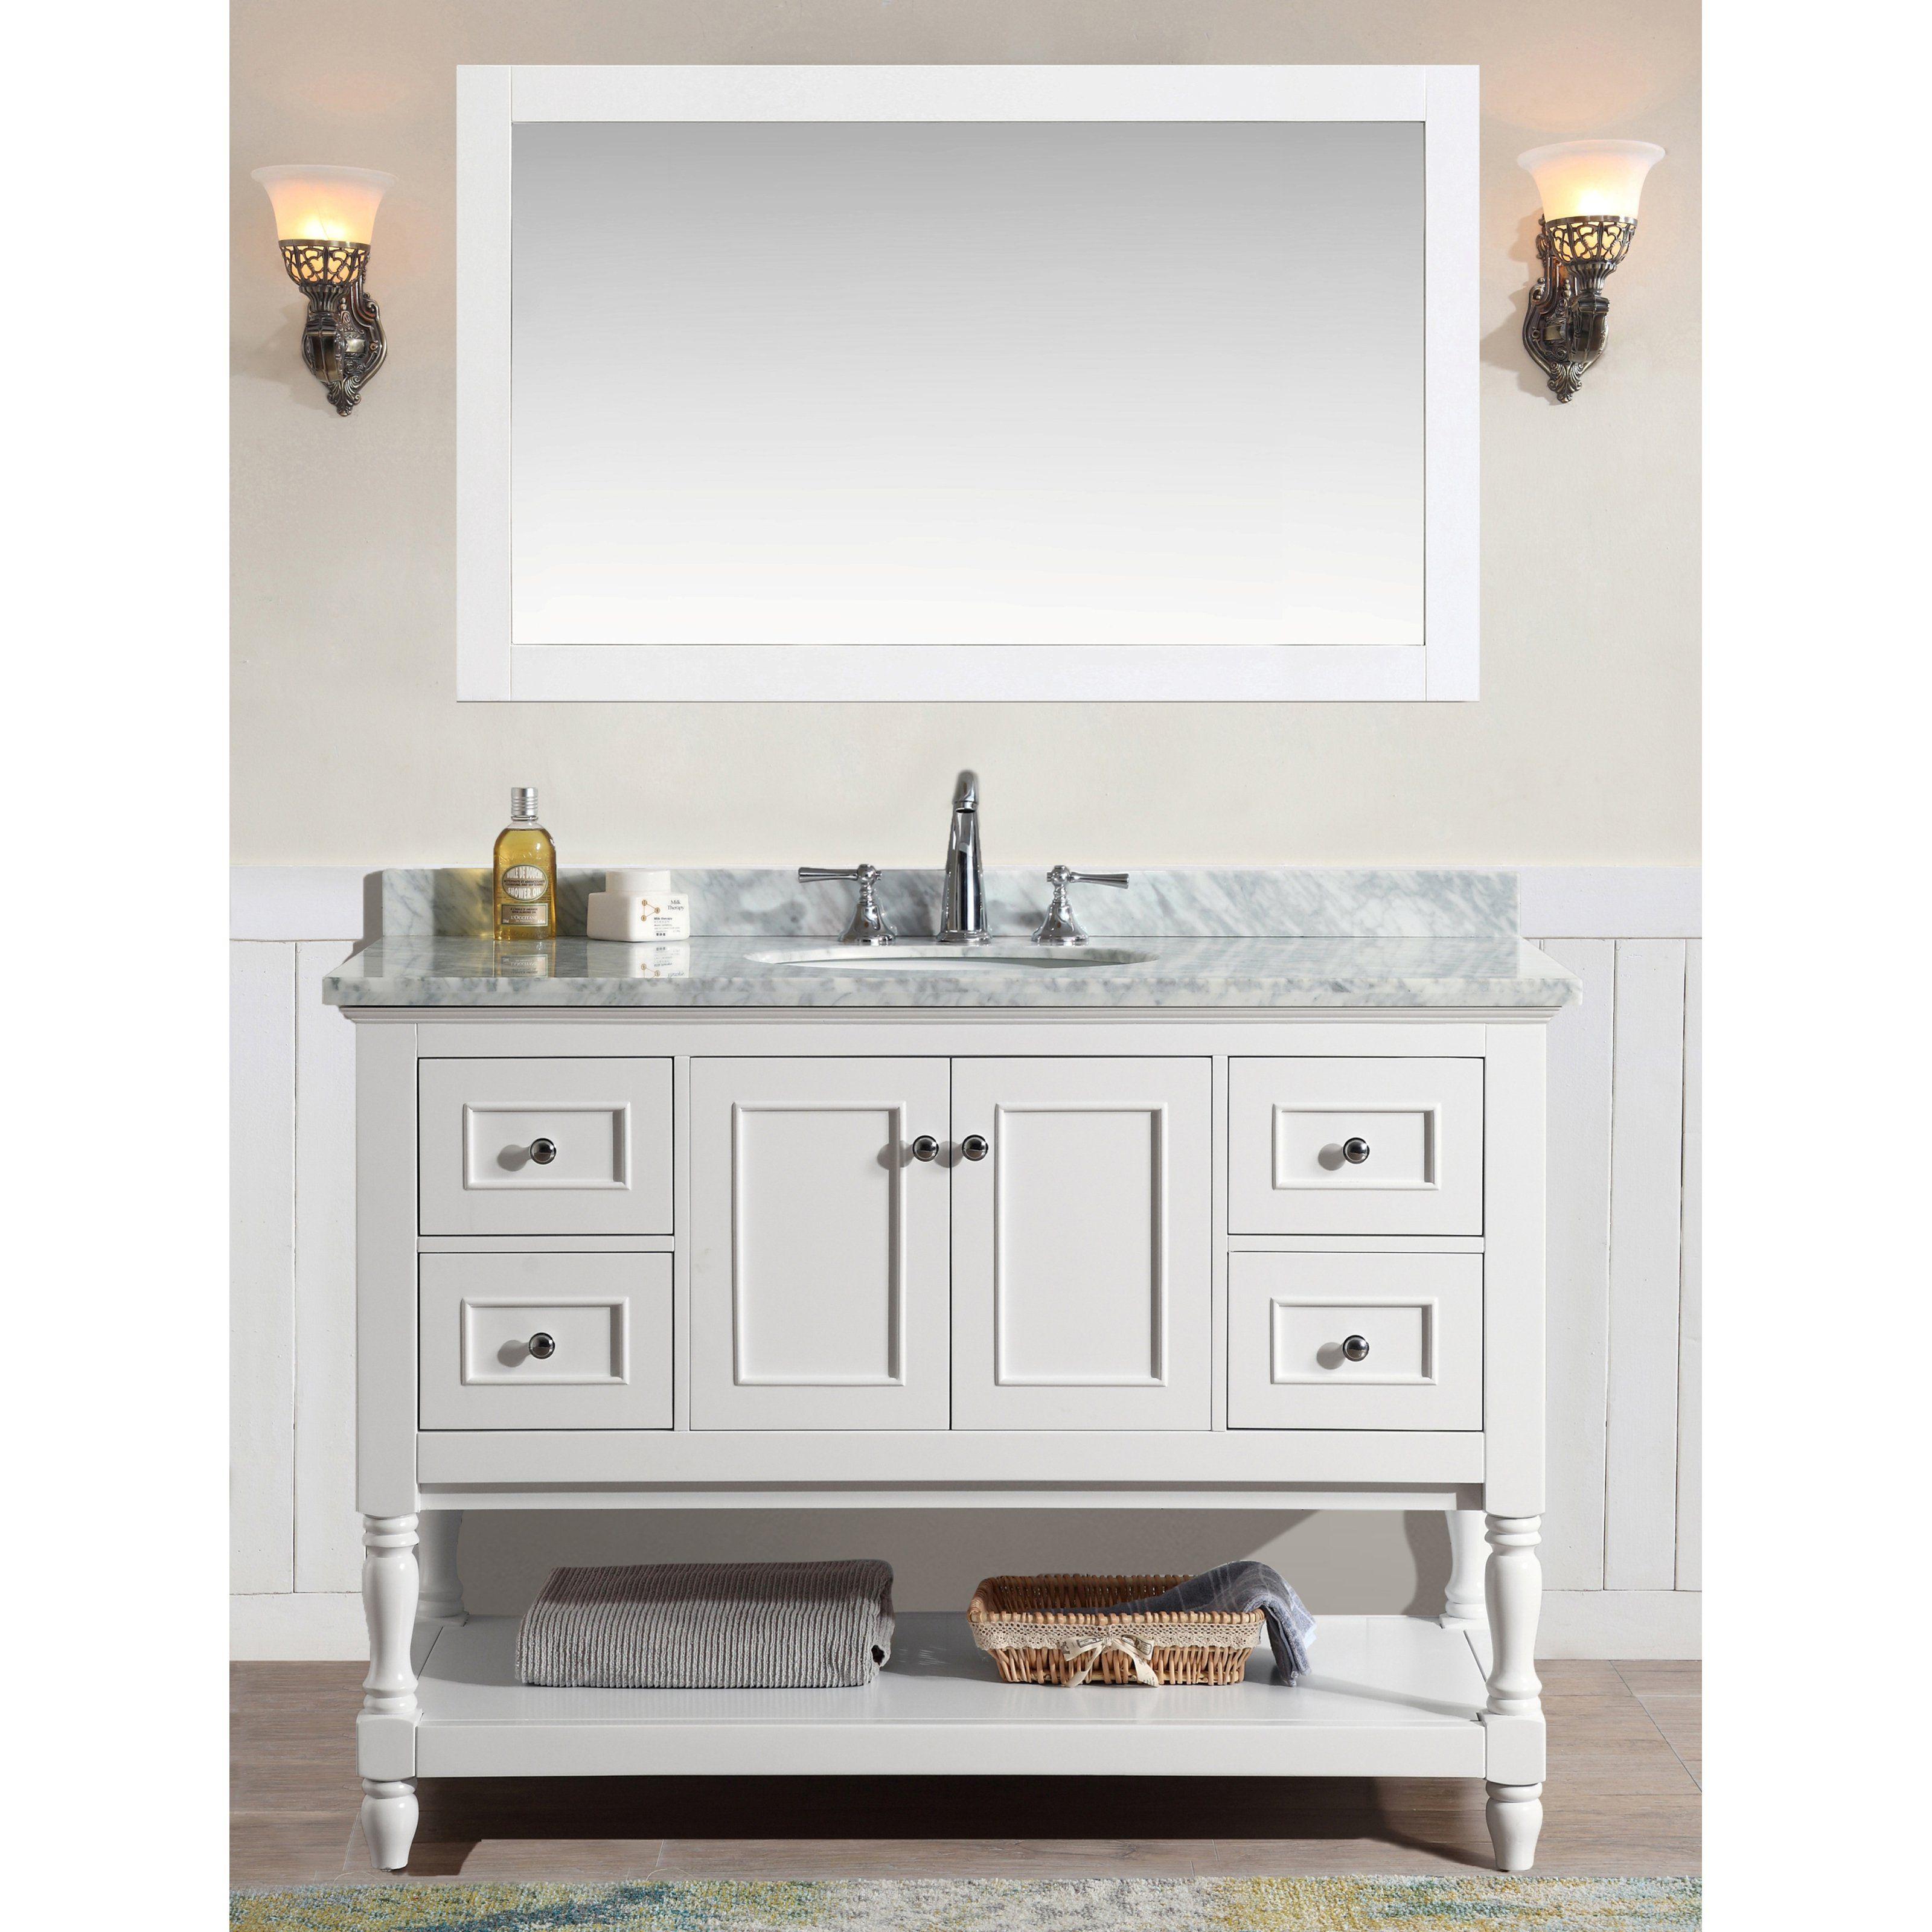 Ari Kitchen and Bath Cape Cod 48 in. Single Bathroom Vanity Set with ...